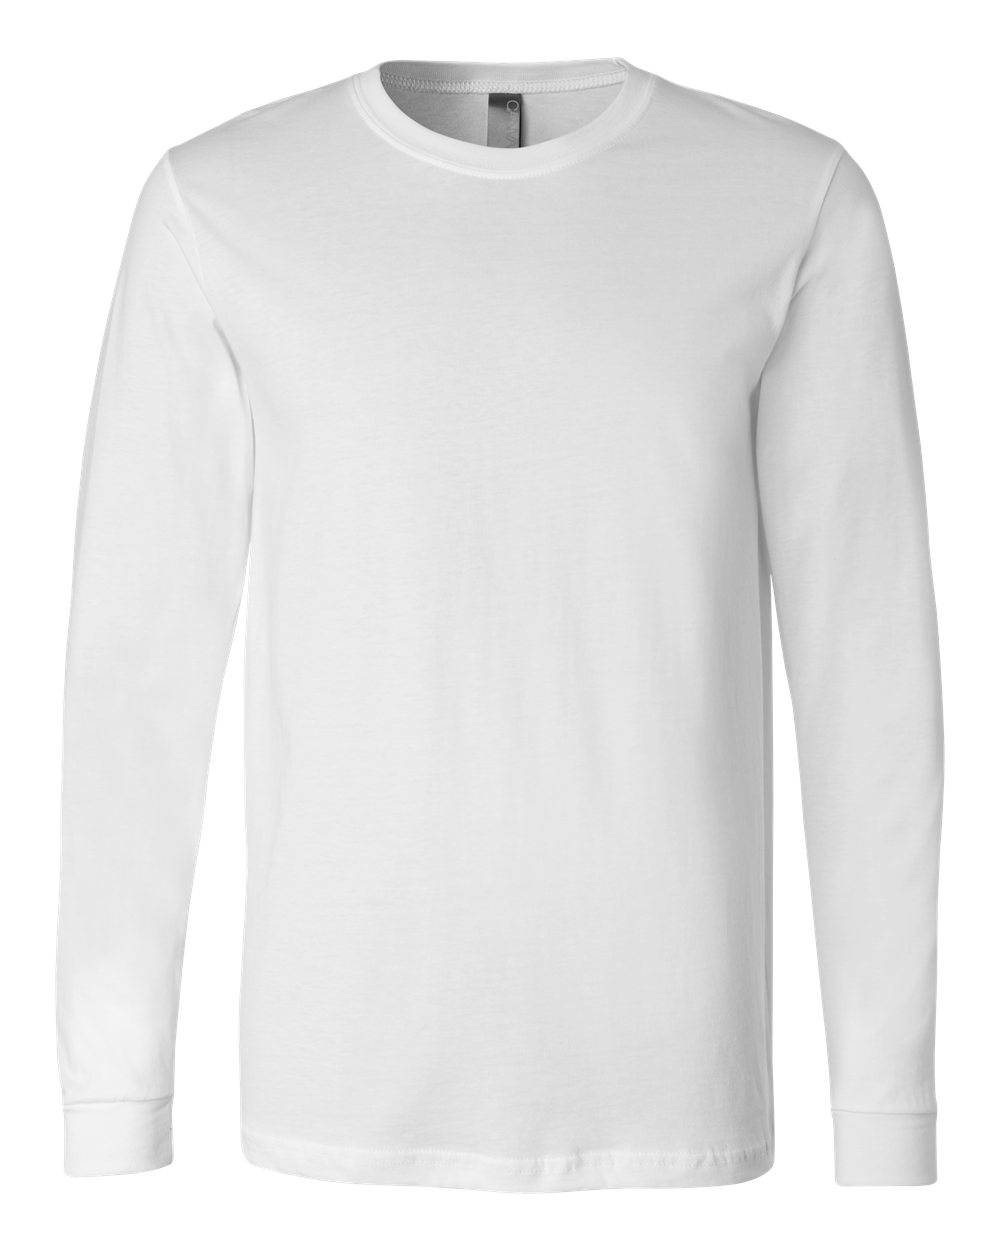 Bella-Canvas-Mens-Blank-Top-Long-Sleeve-Jersey-Tee-T-Shirt-3501-up-to-3XL thumbnail 116